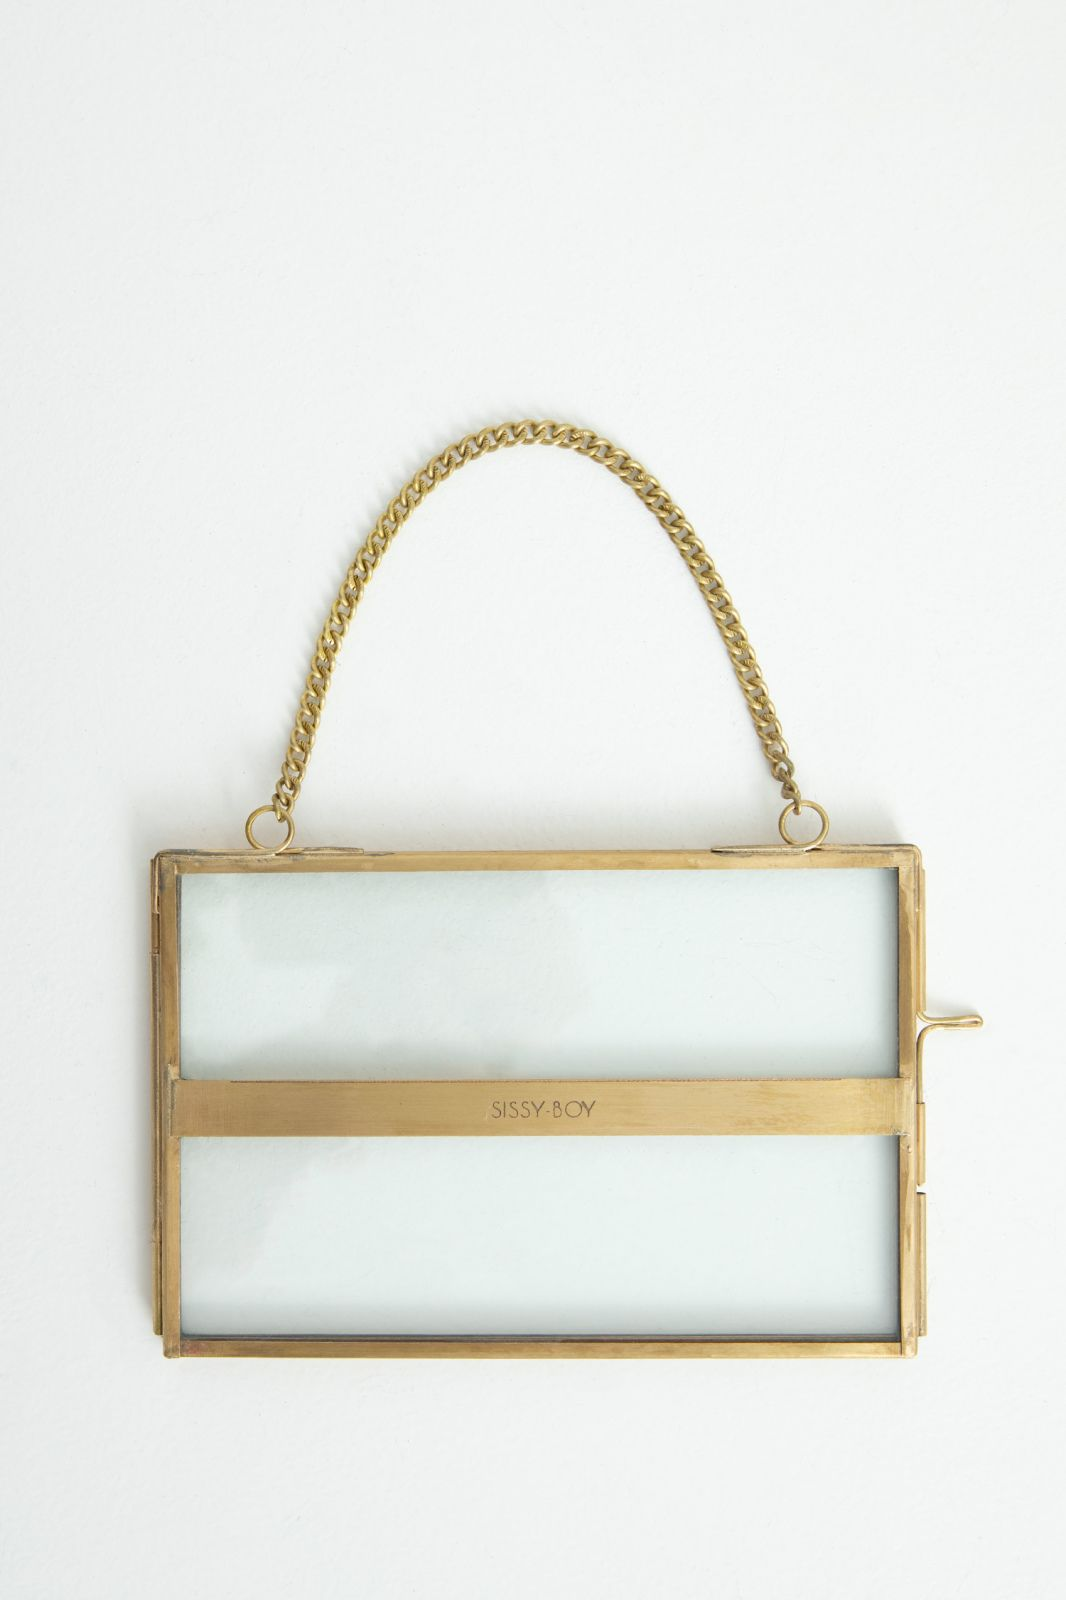 Fotolijst hanger (18x12,5 cm) - Homeland | Sissy-Boy